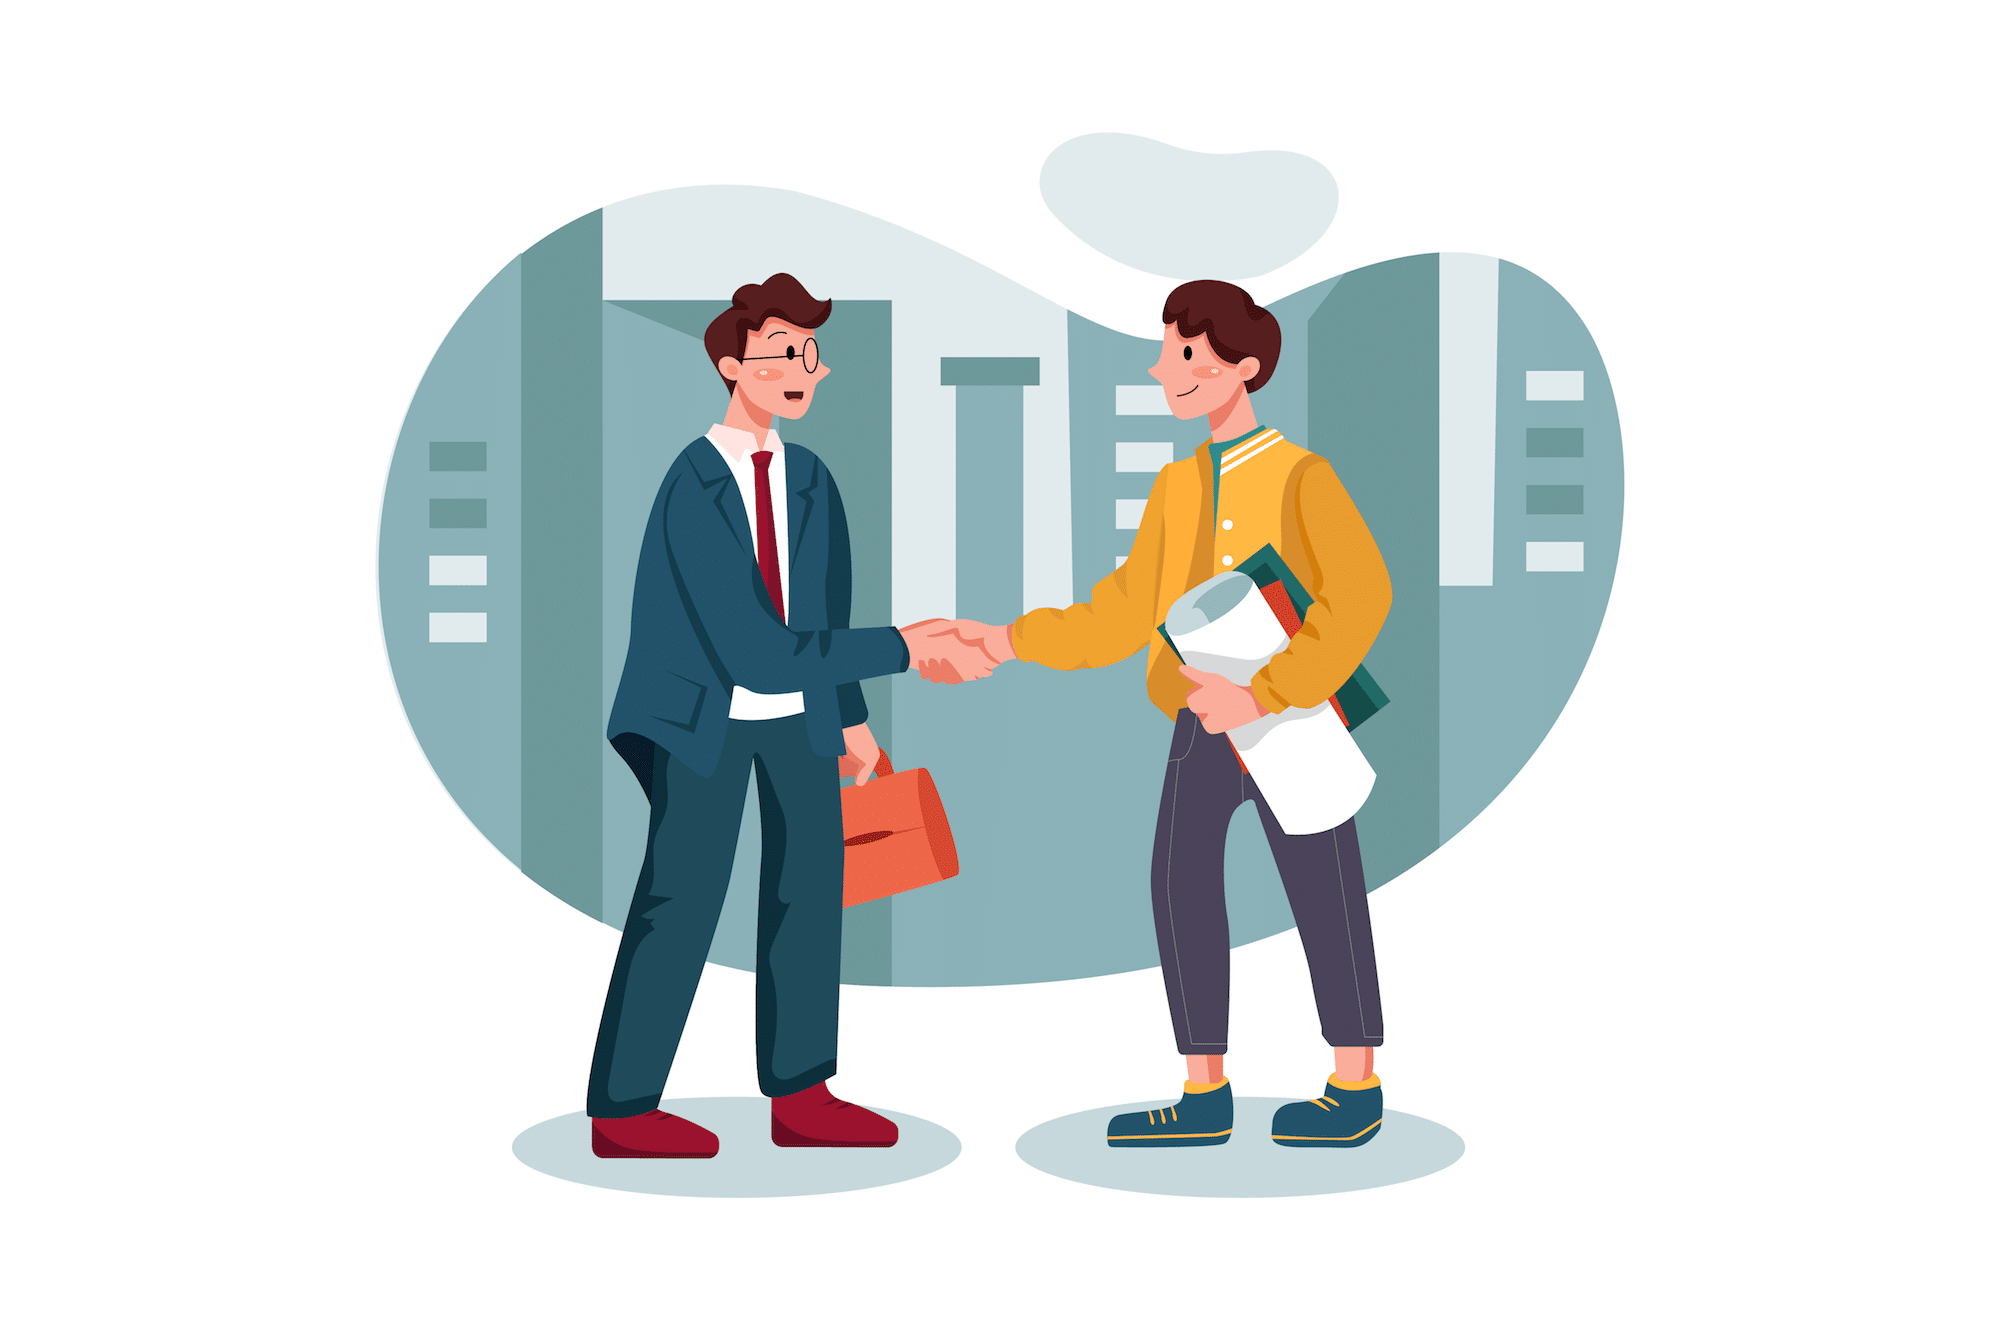 Graphic of businessmen shaking hands